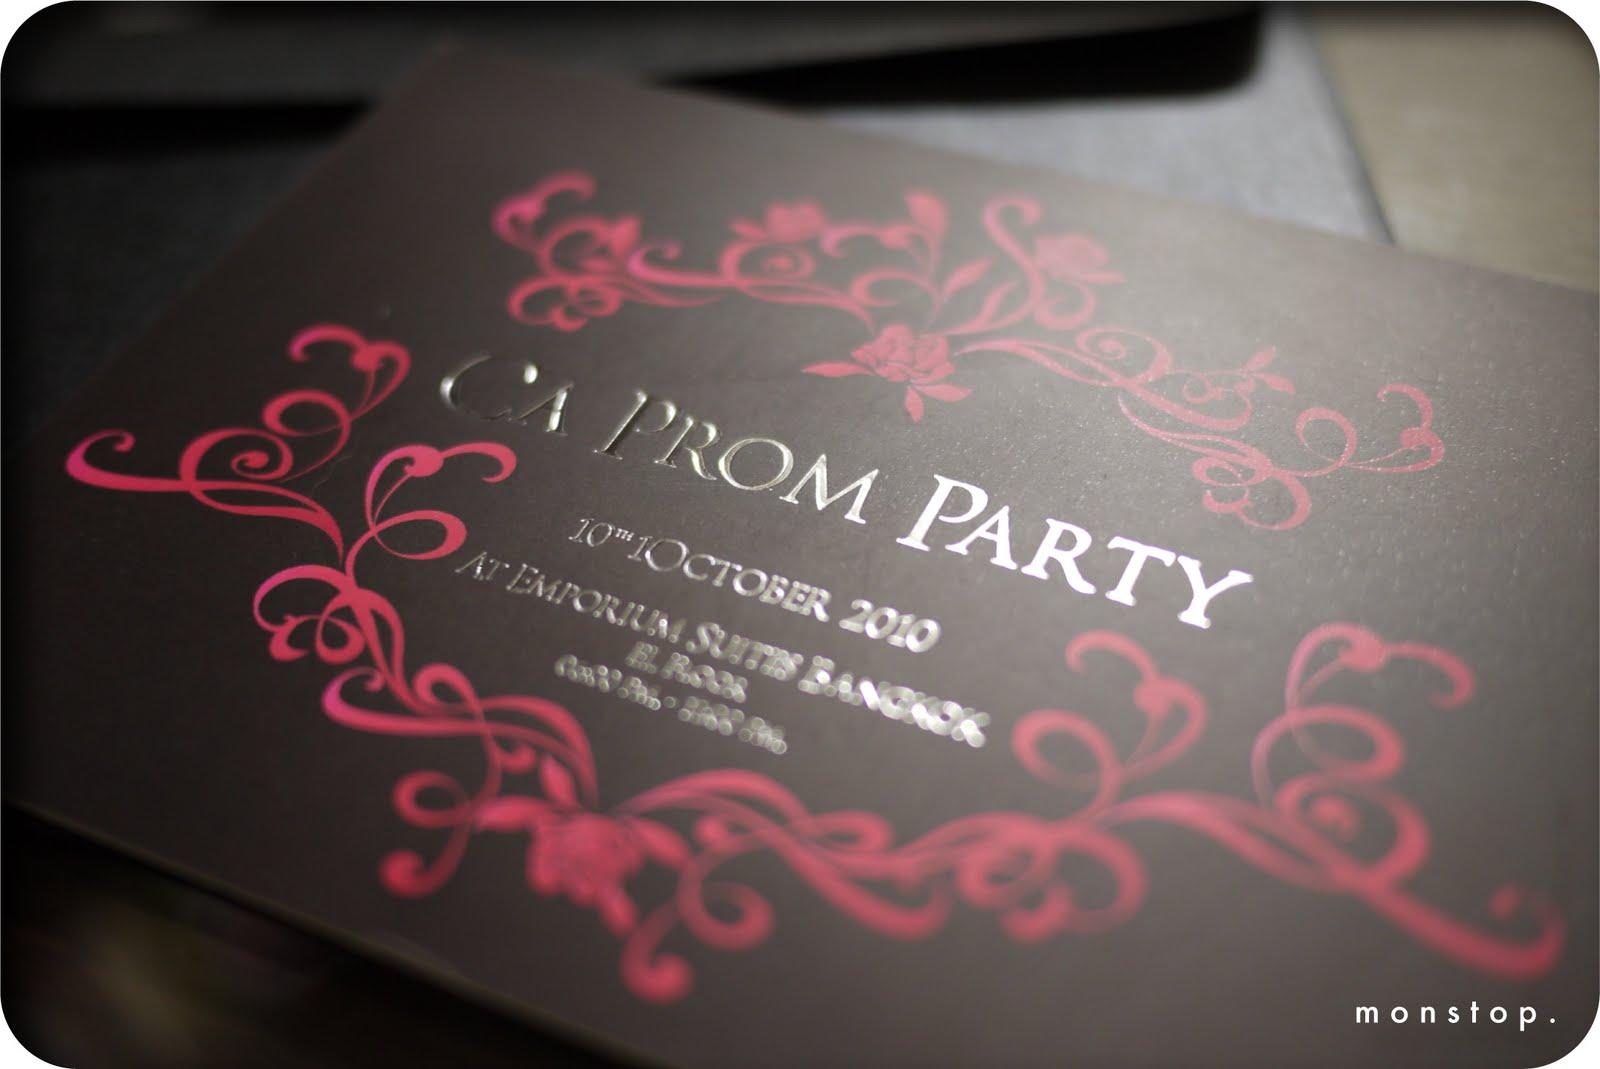 m o n s t o p .: invitation card - ca prom party